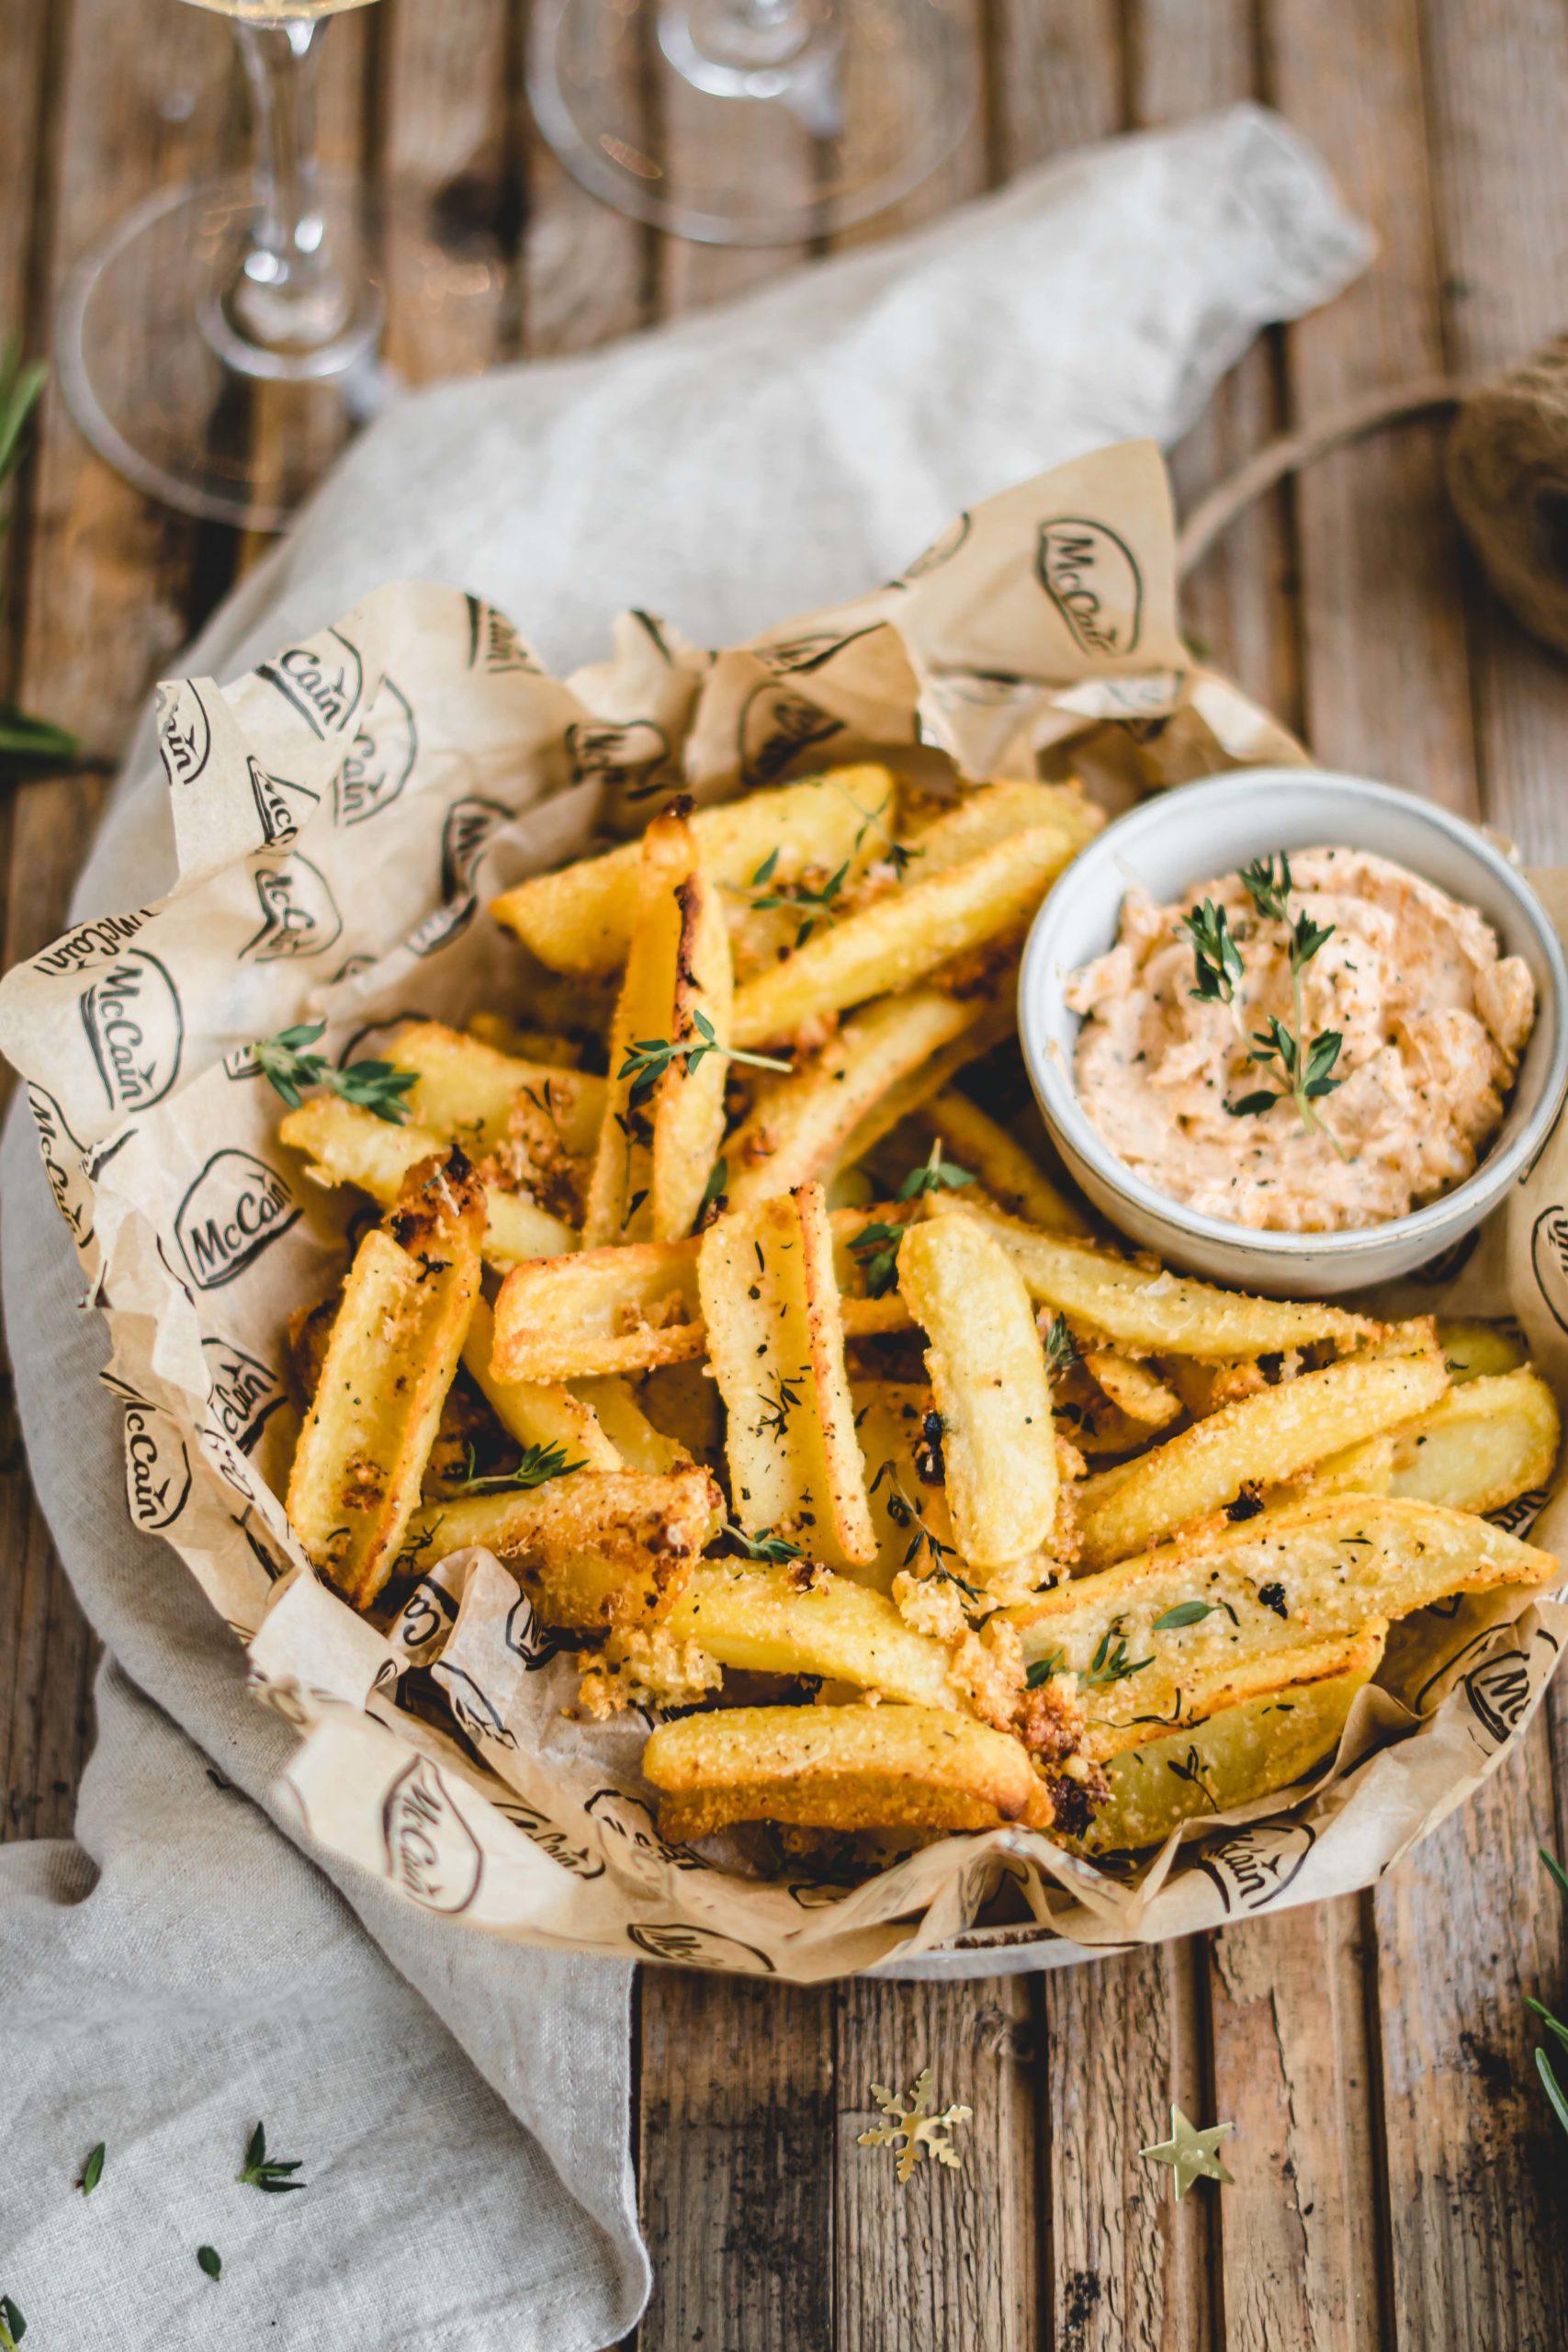 Garlic Parmesan Fries met pestodip